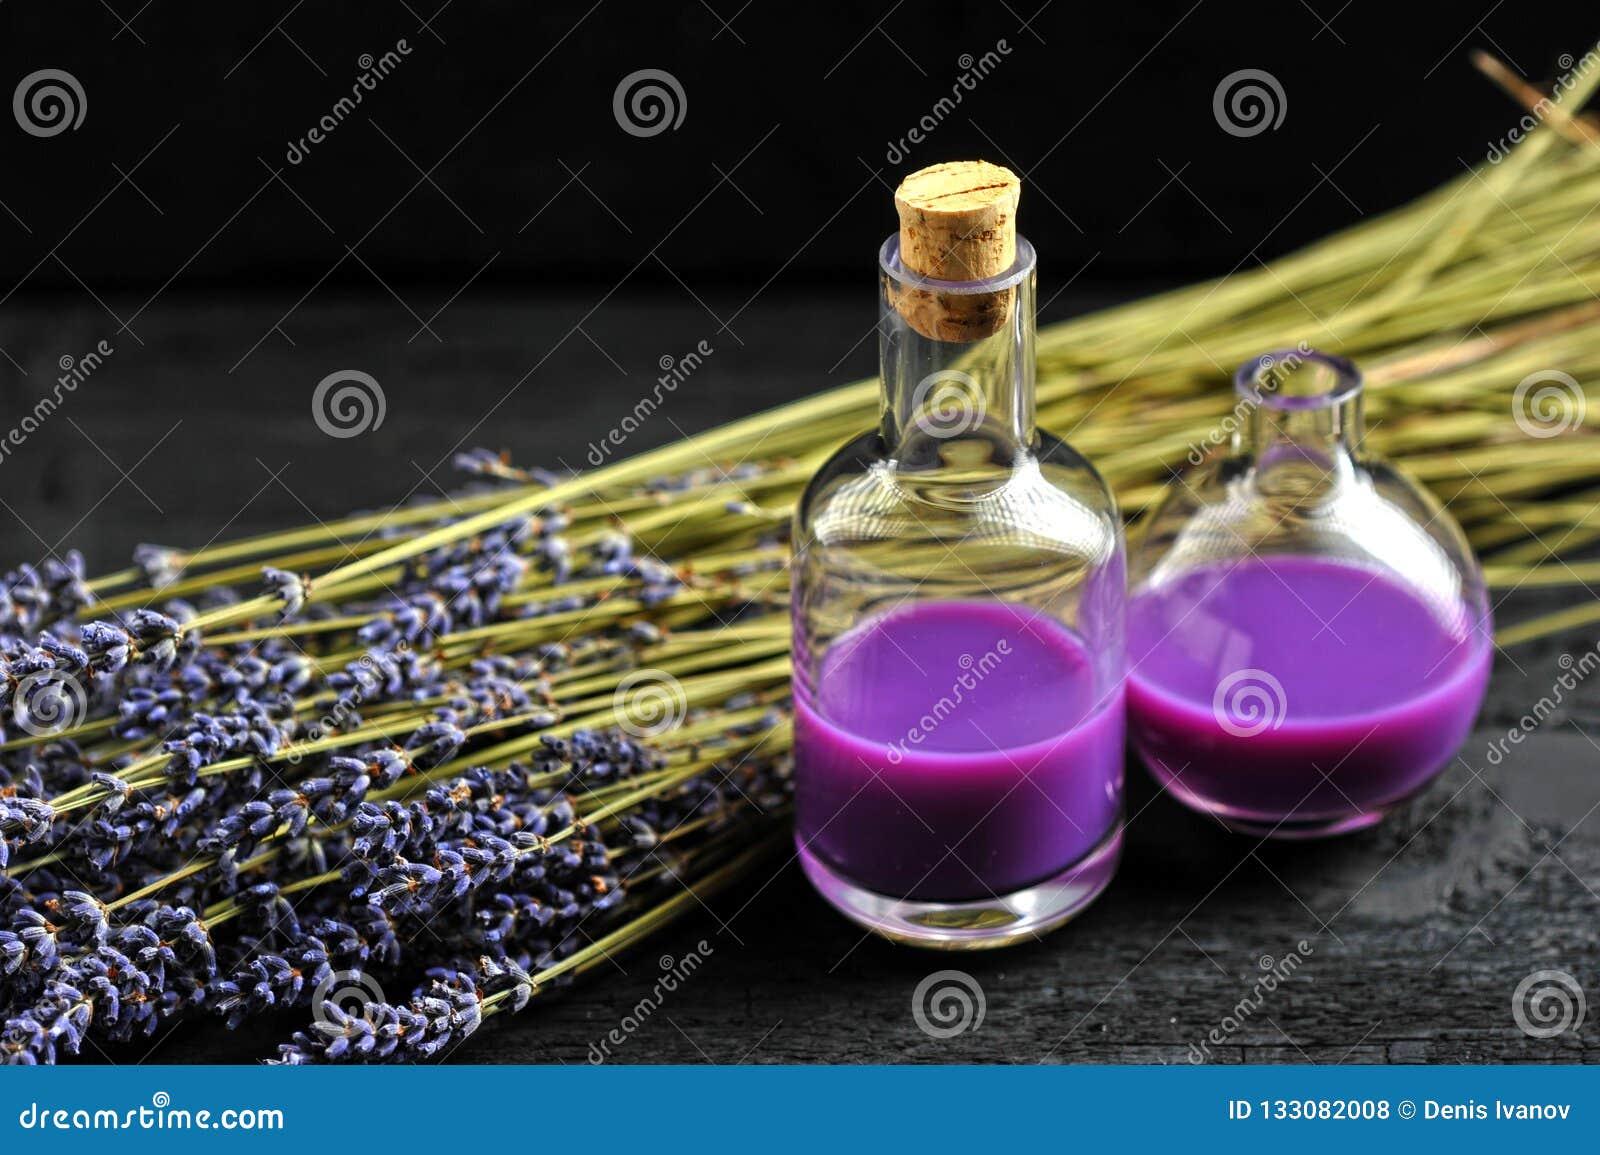 Lavendel, Lavendelöl auf dunklem hölzernem Hintergrund